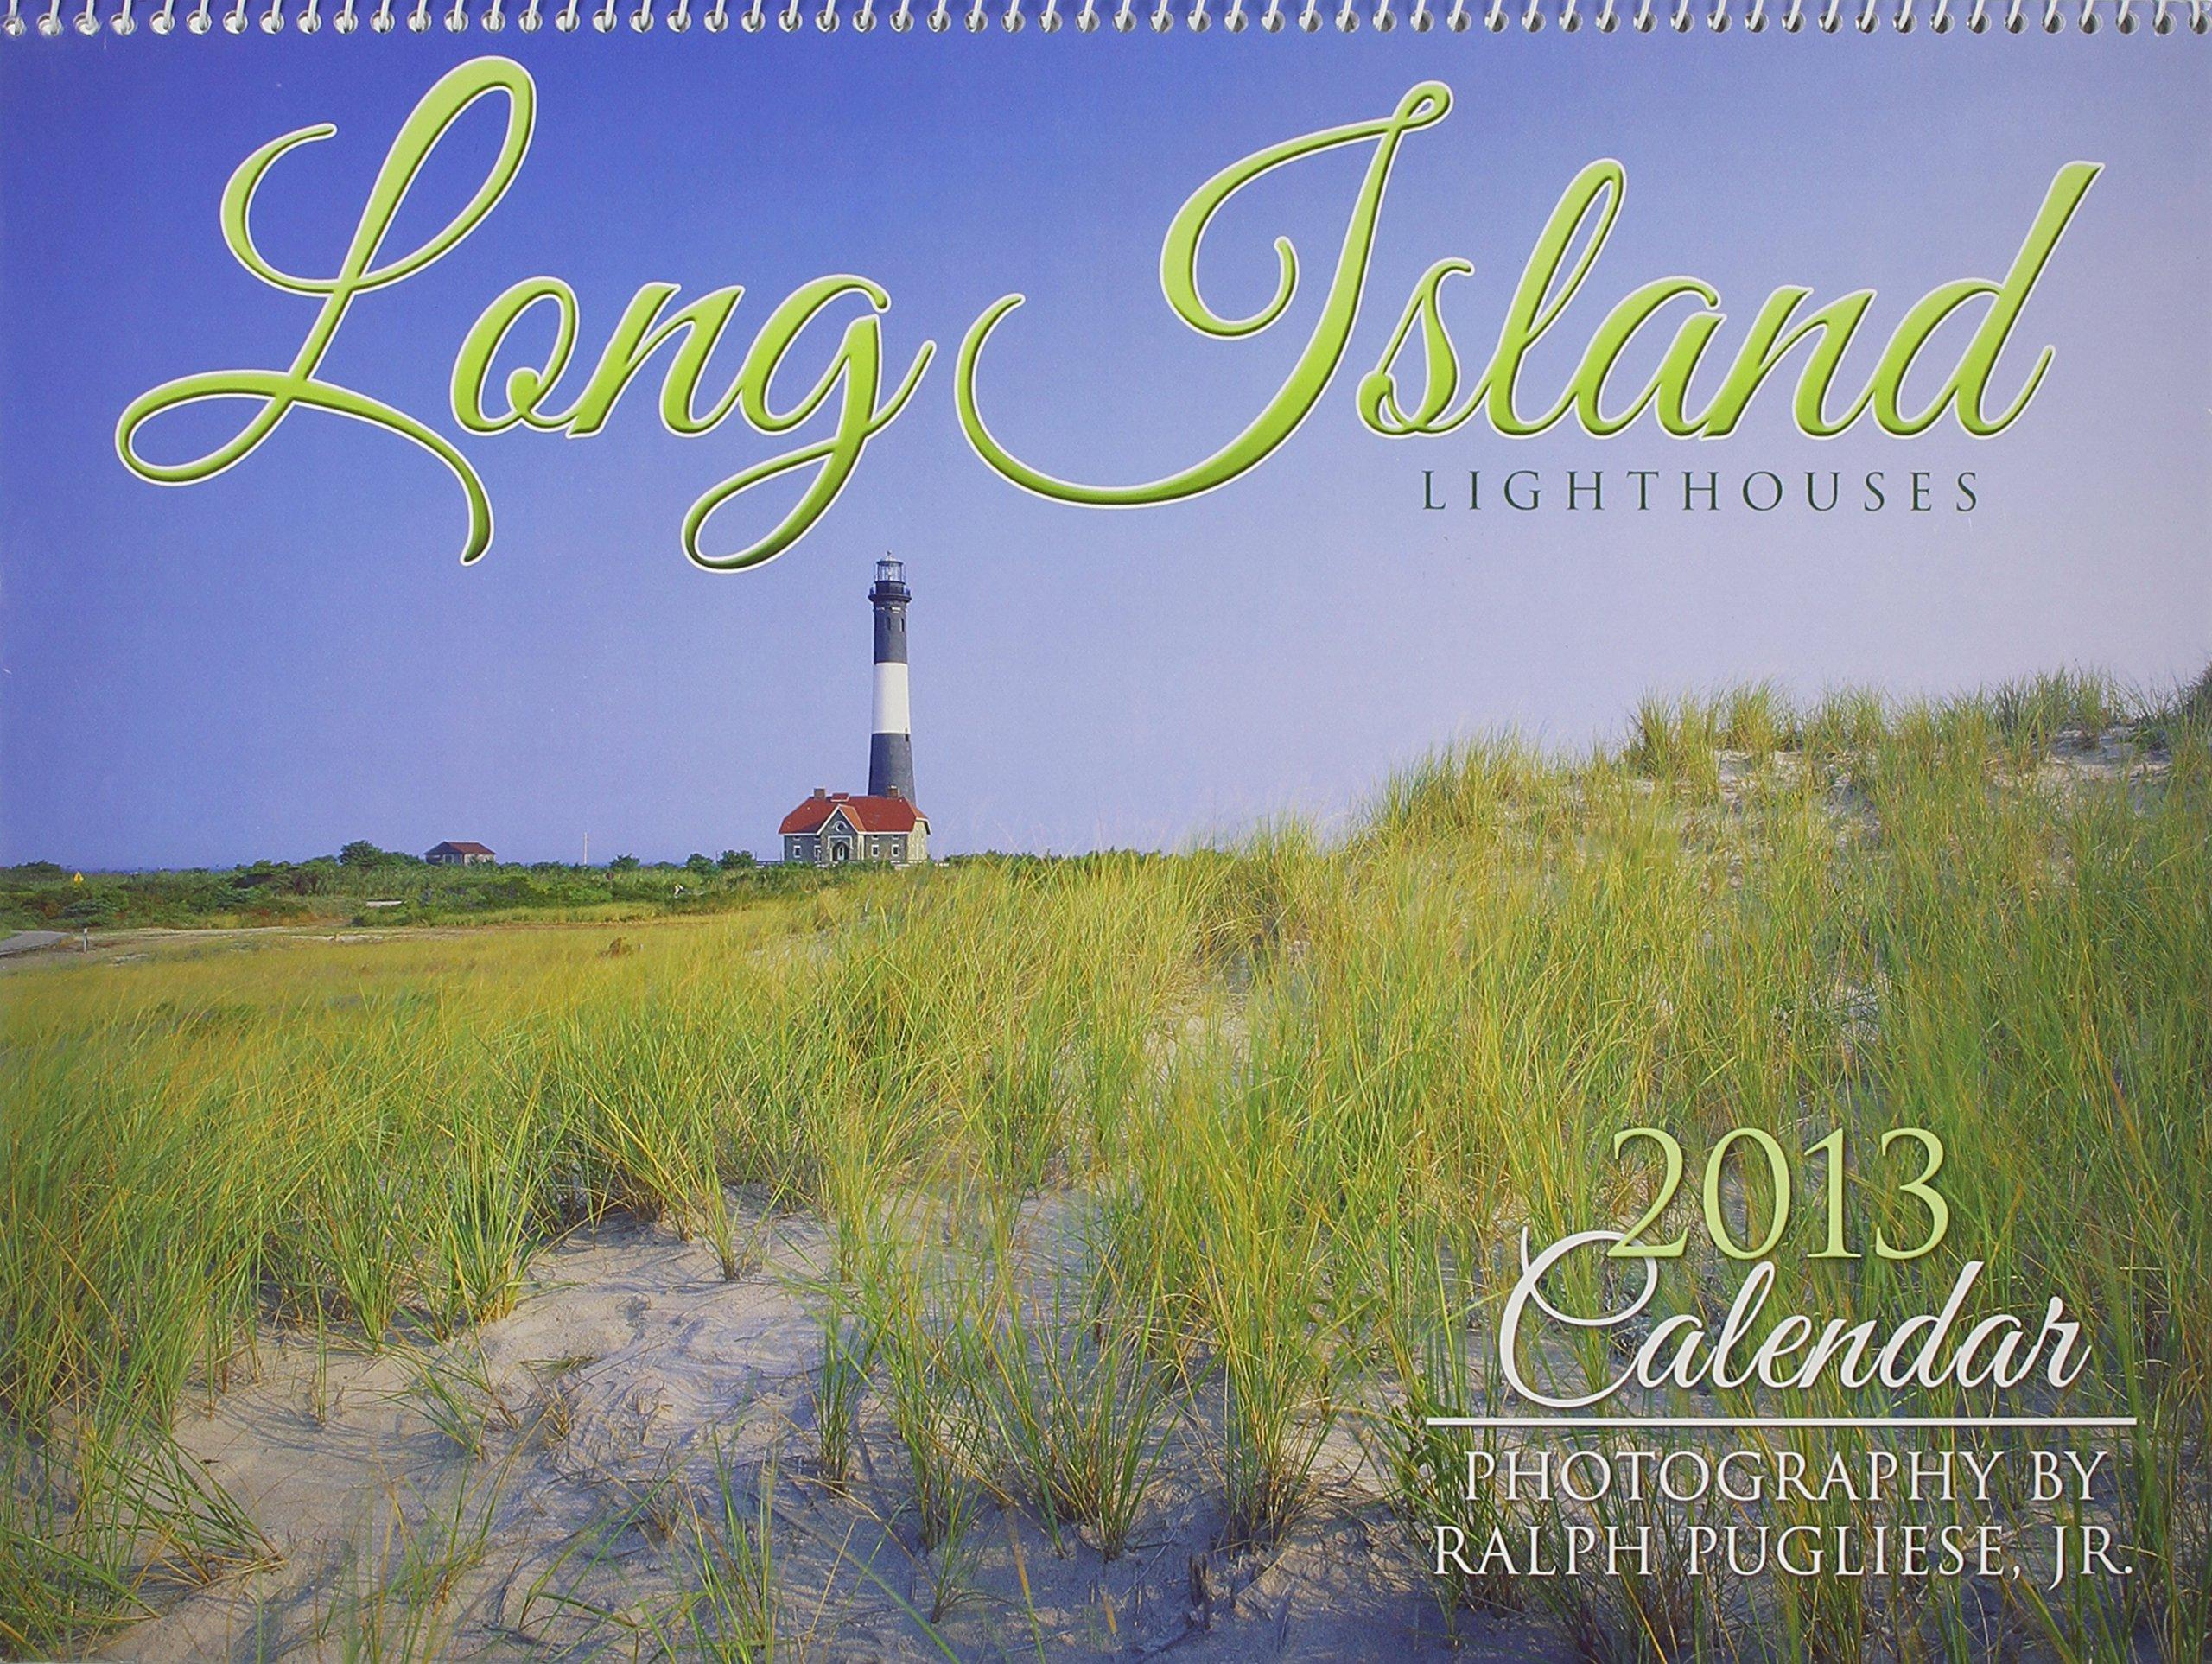 Long Island Lighthouses 2013 Calendar